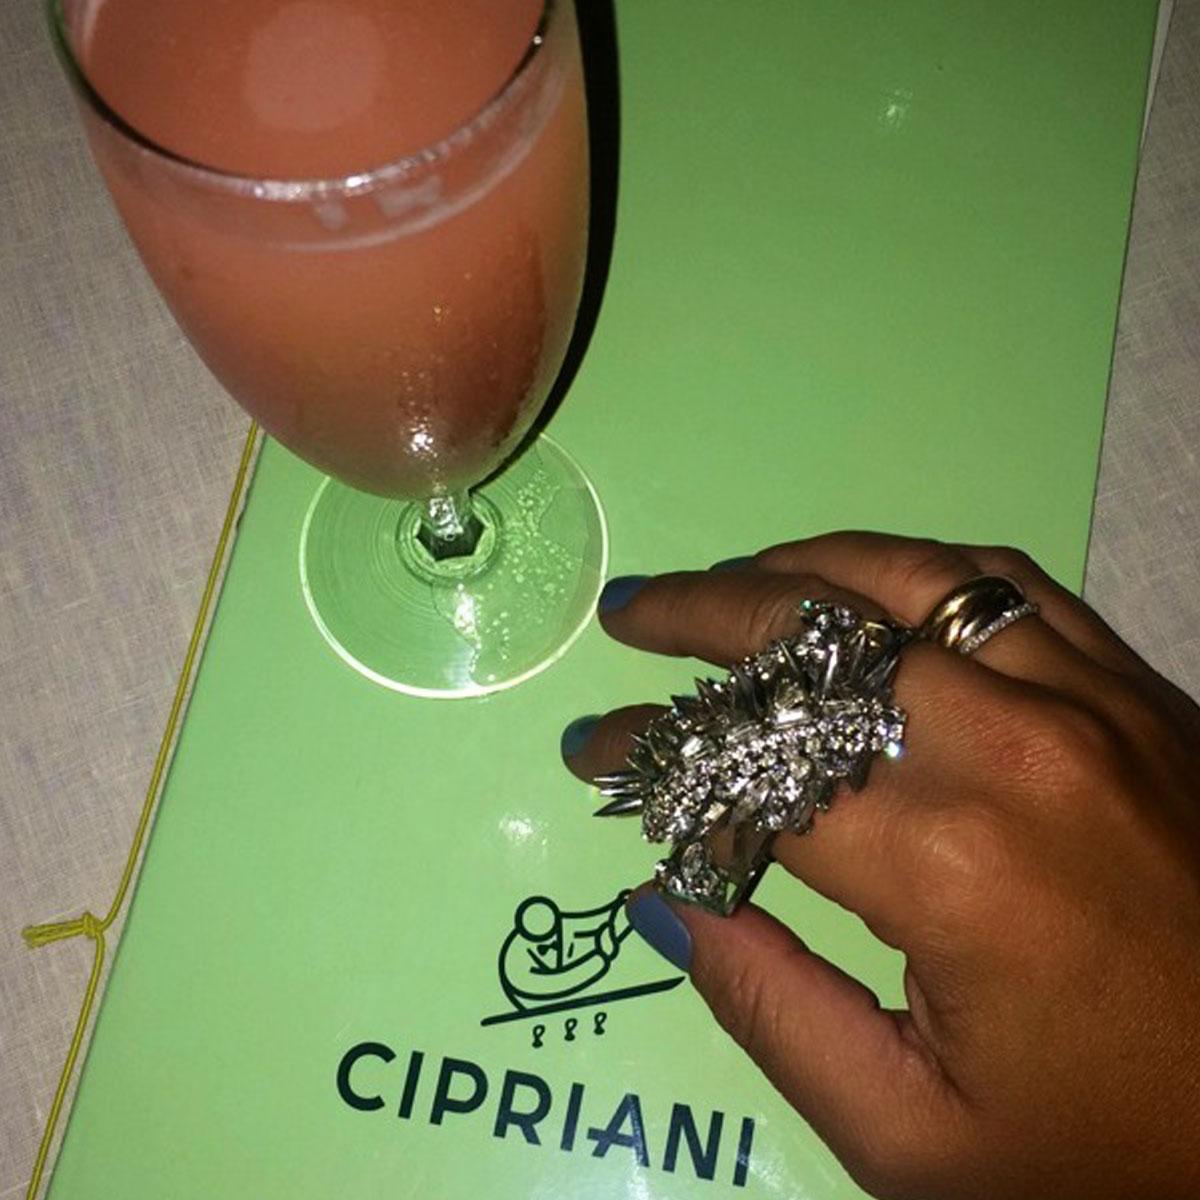 chipriani